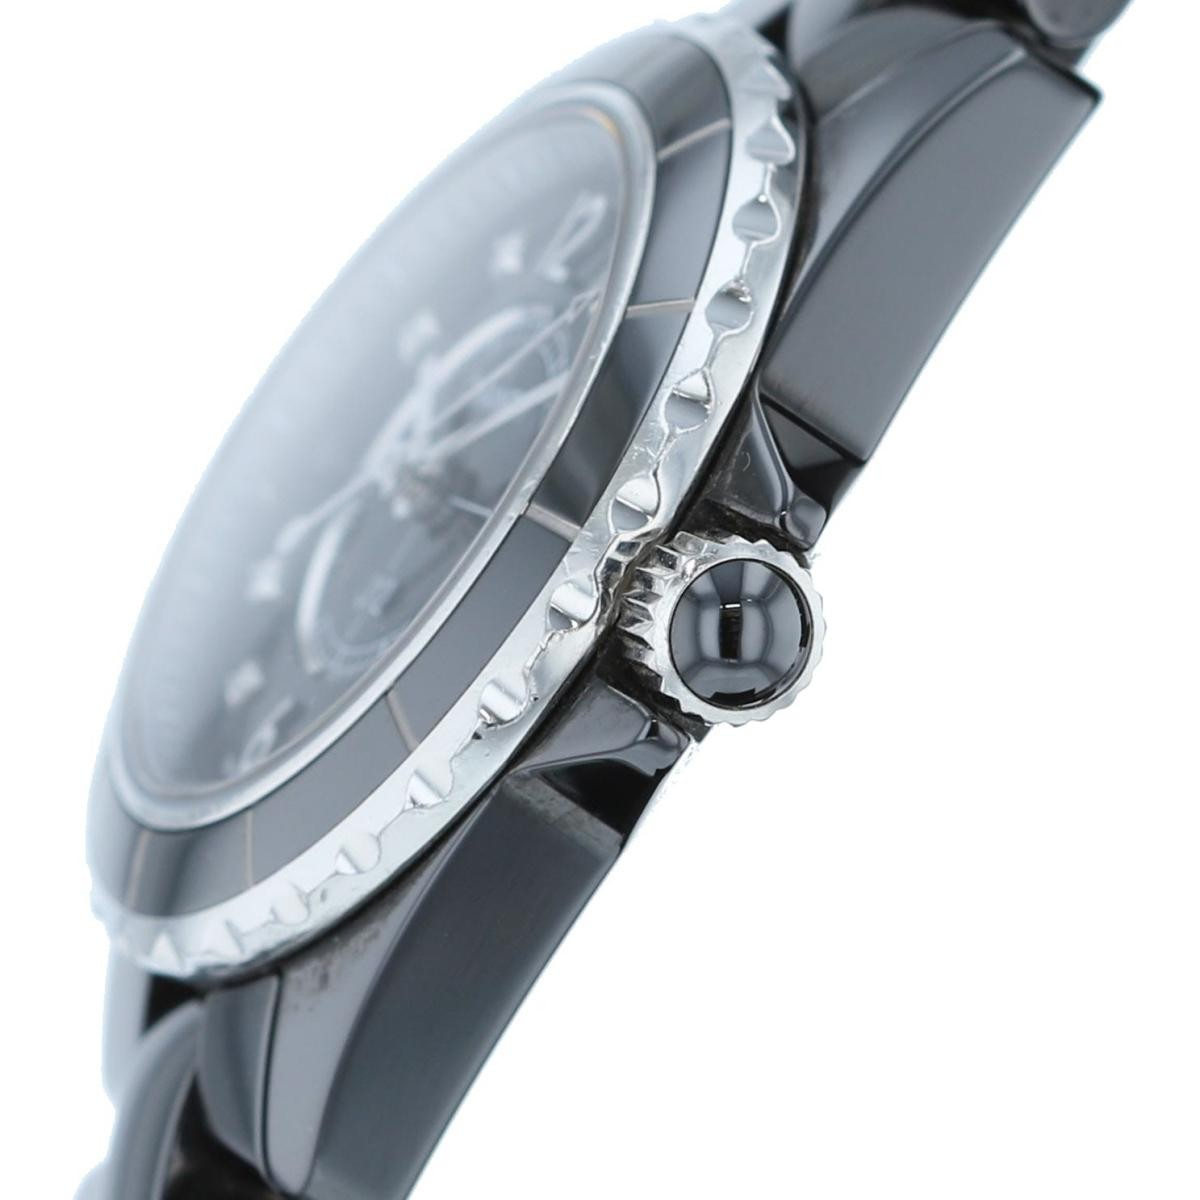 【SALE】【即日発送・水曜定休日・木曜発送】【中古】【RI】  CHANEL (シャネル) J12 29� 8Pダイヤモンド 時計 クオーツ/レディース J12/Black Black/ブラック H2569 used:B